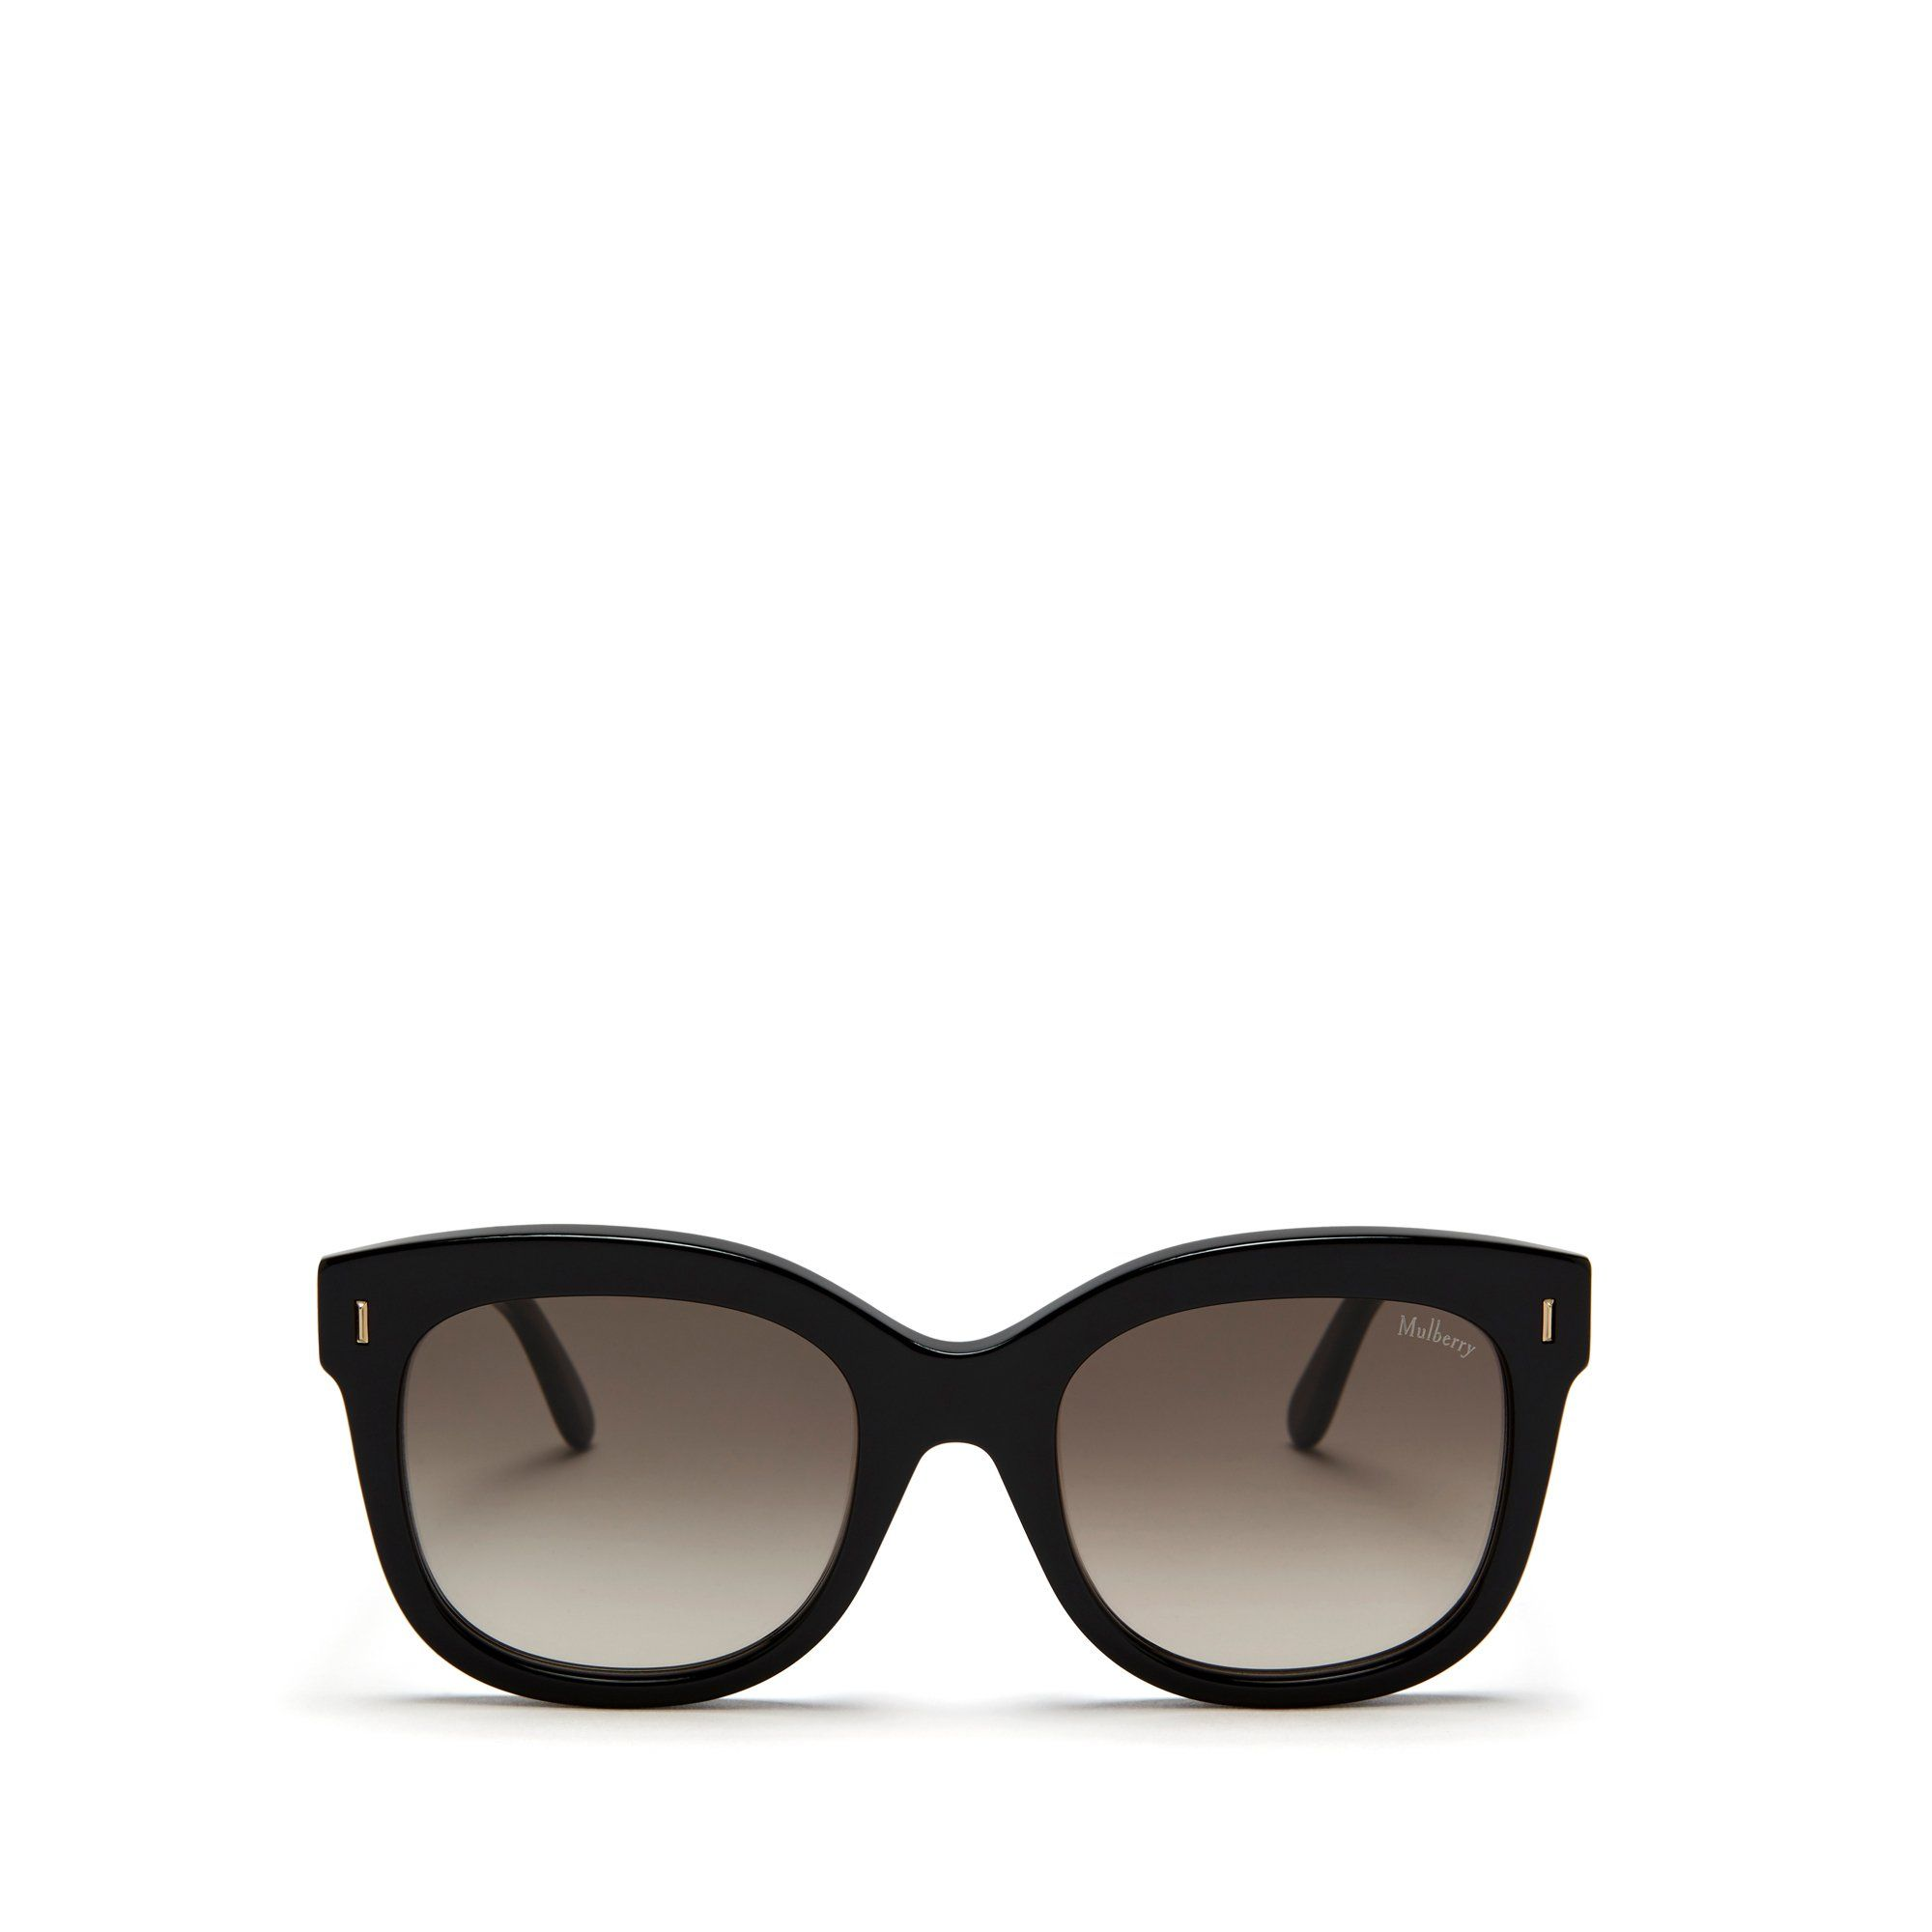 cd62810a7567 Sunglasses | Mulberry